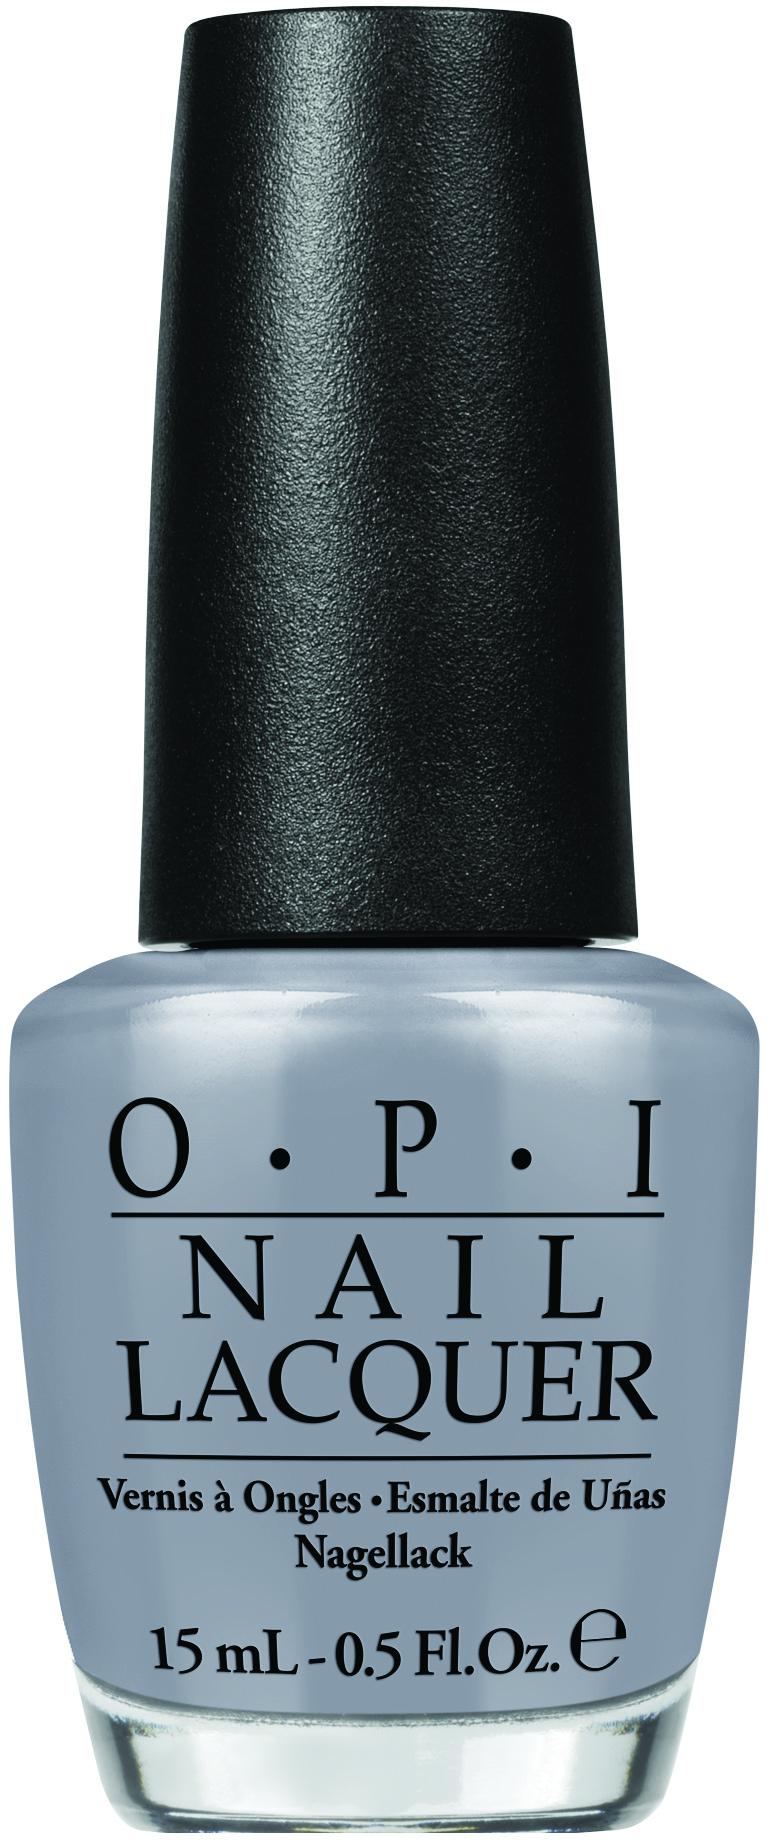 Opi, Embrace The Gray 16,80 €.